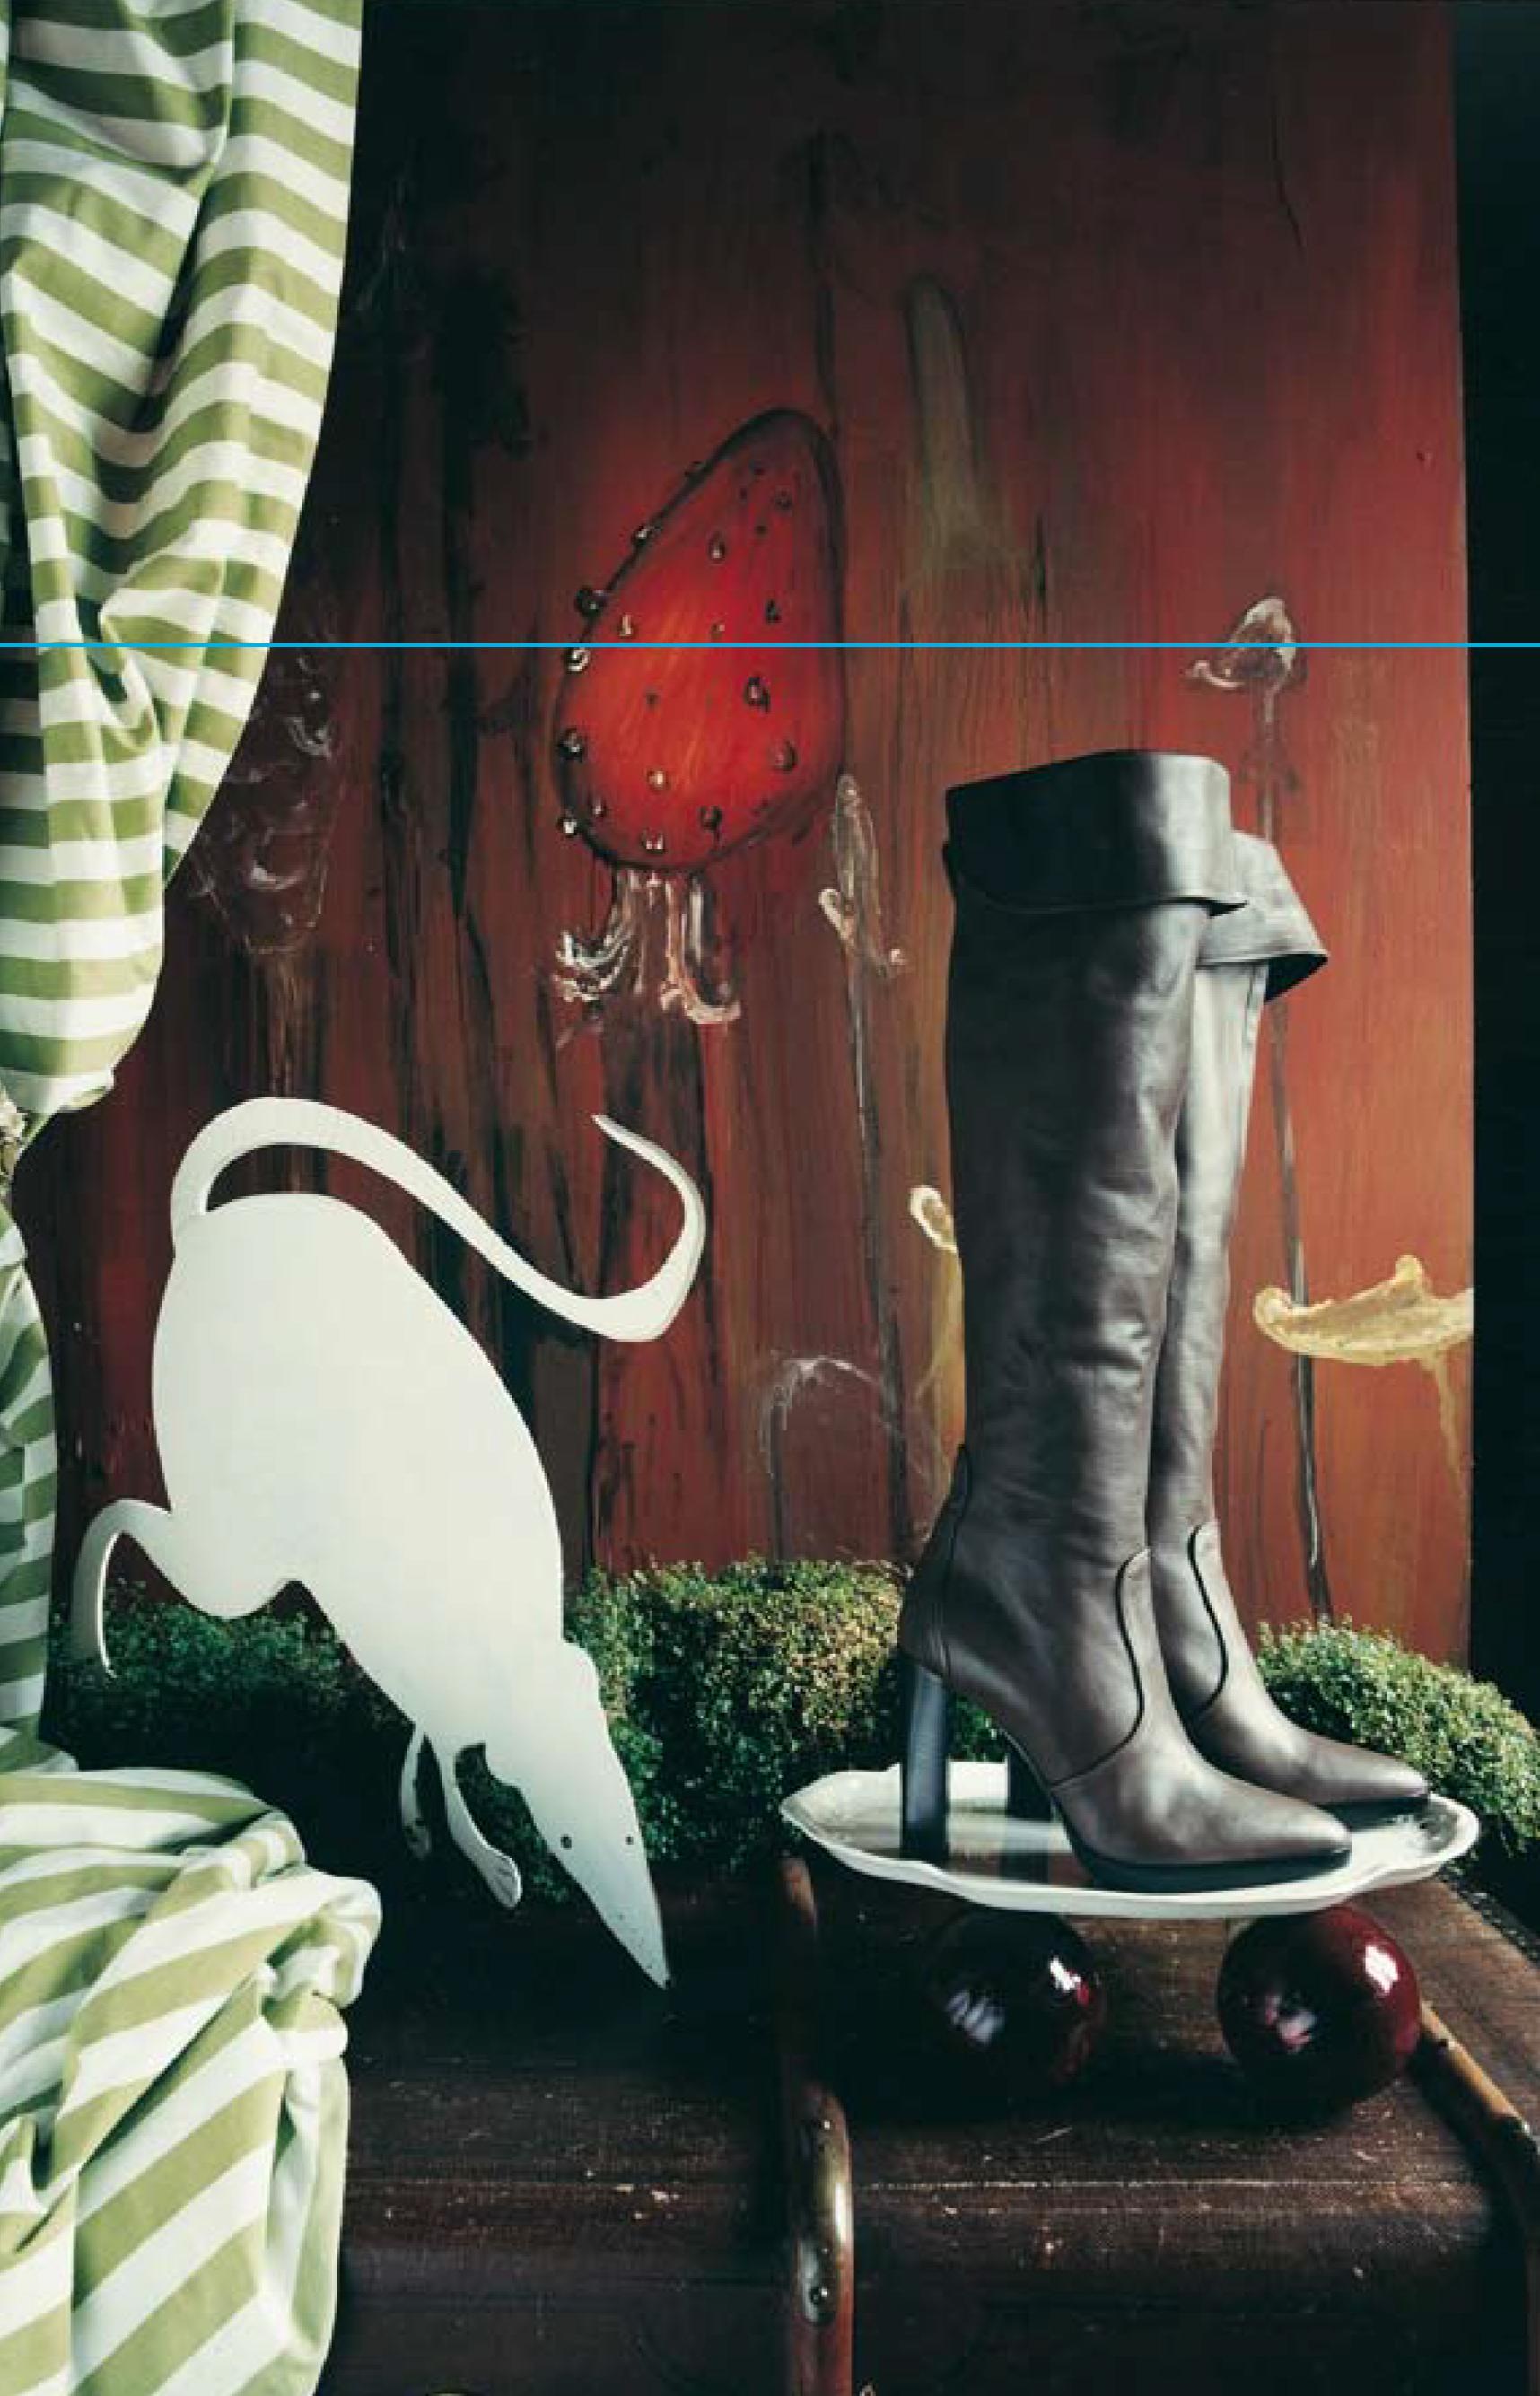 Hermès by Tine Drefahl for ICONOfly, 2008